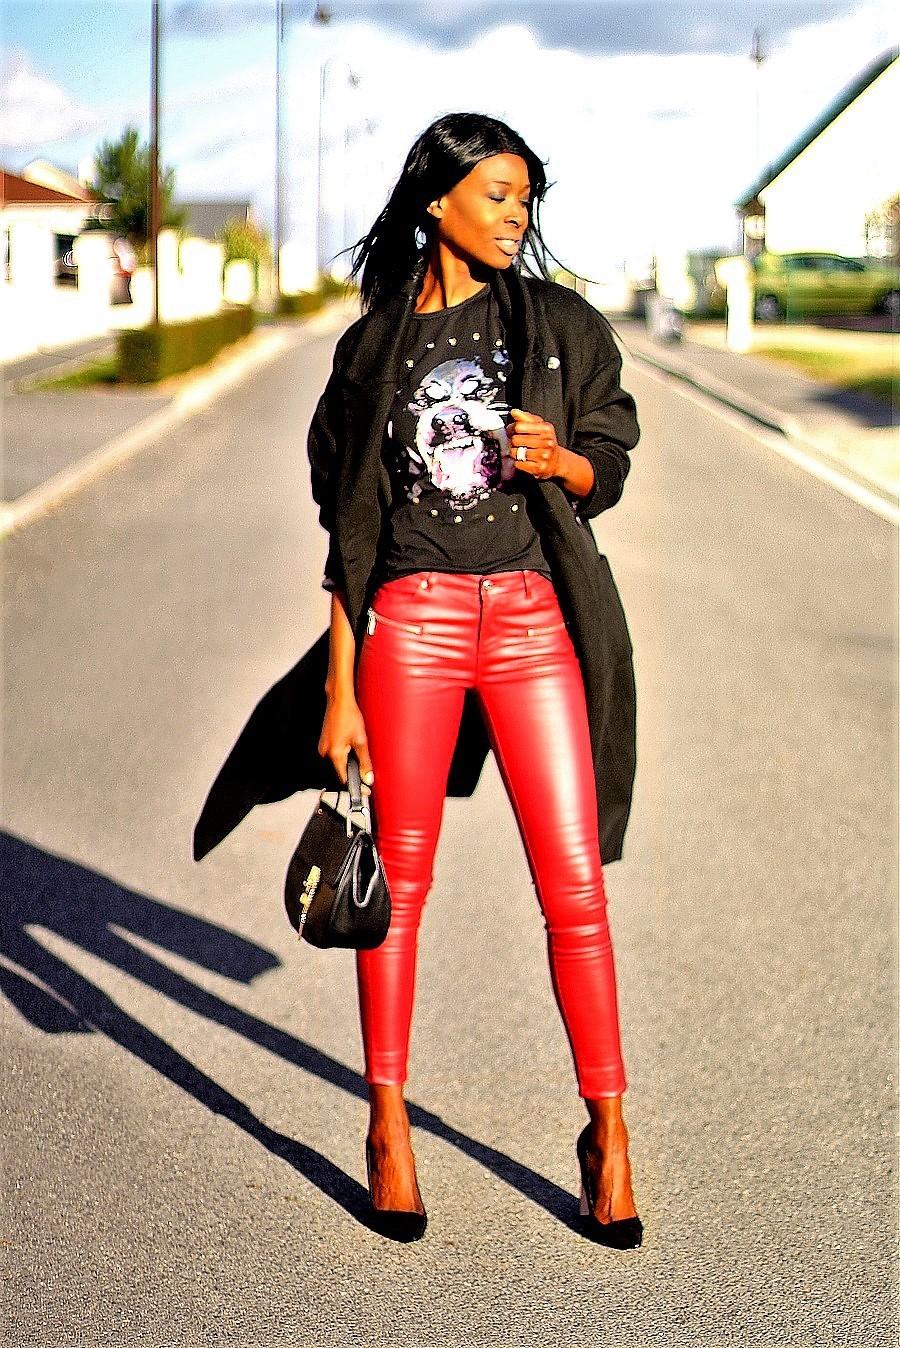 pantalon-cuir-rouge-t-shirt-givenchy-manteau-oversize-sac-drew-chloe-blog-mode